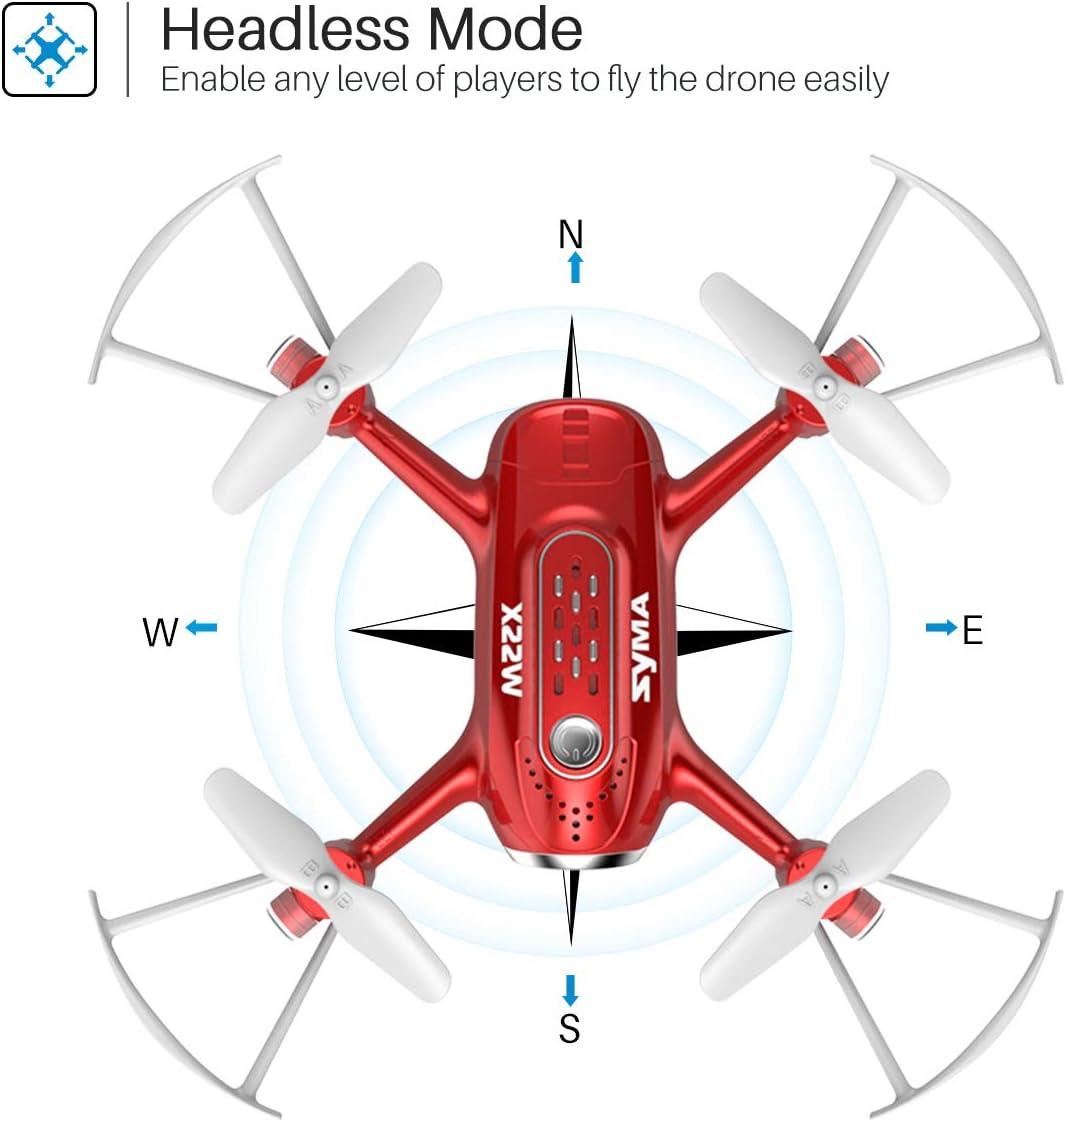 syma X22w mini drone review of headless mode